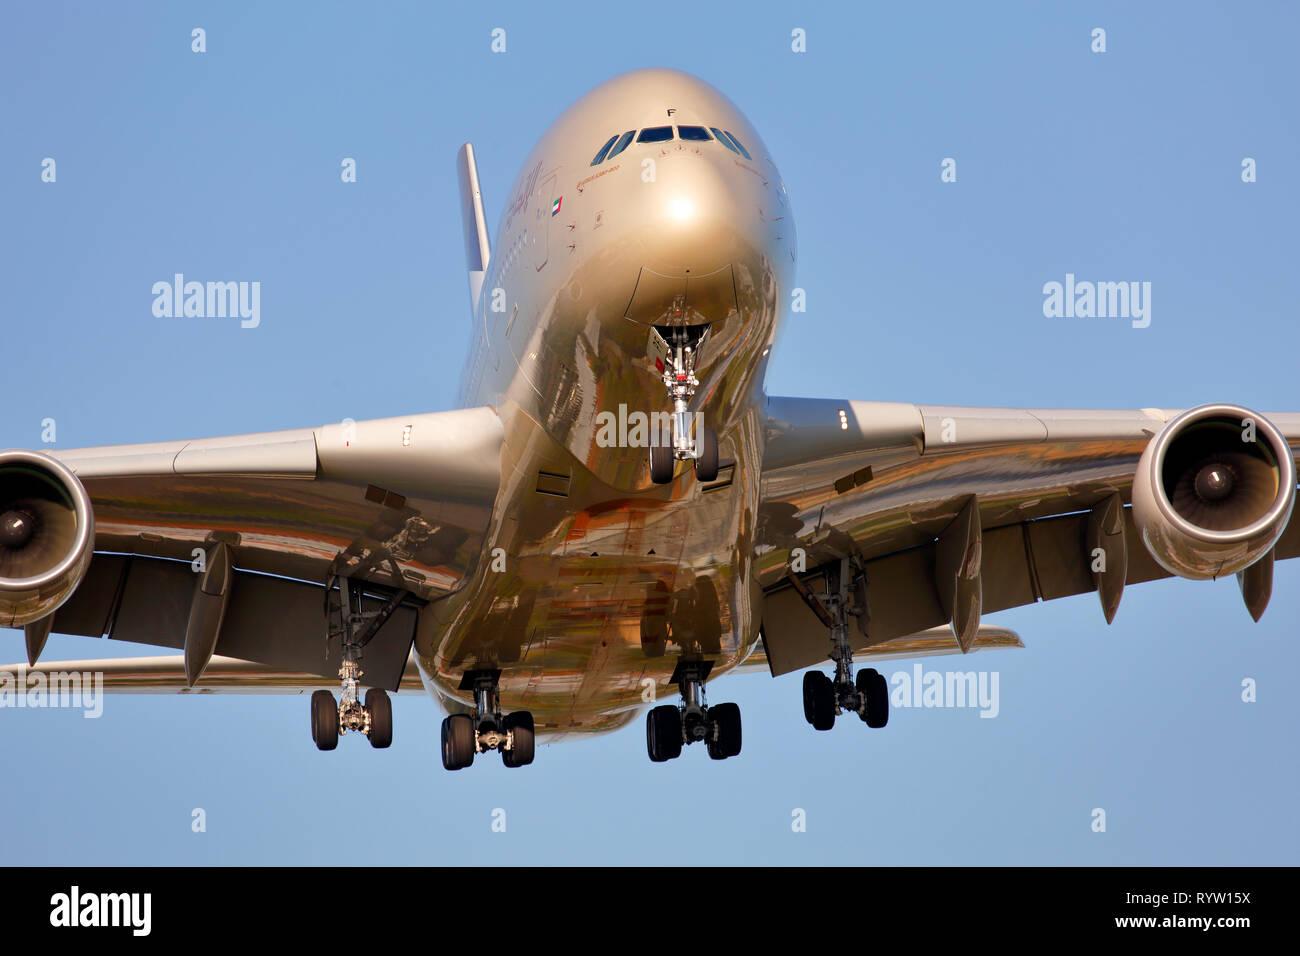 A6-APF Etihad Airways Airbus A380-800 - Stock Image